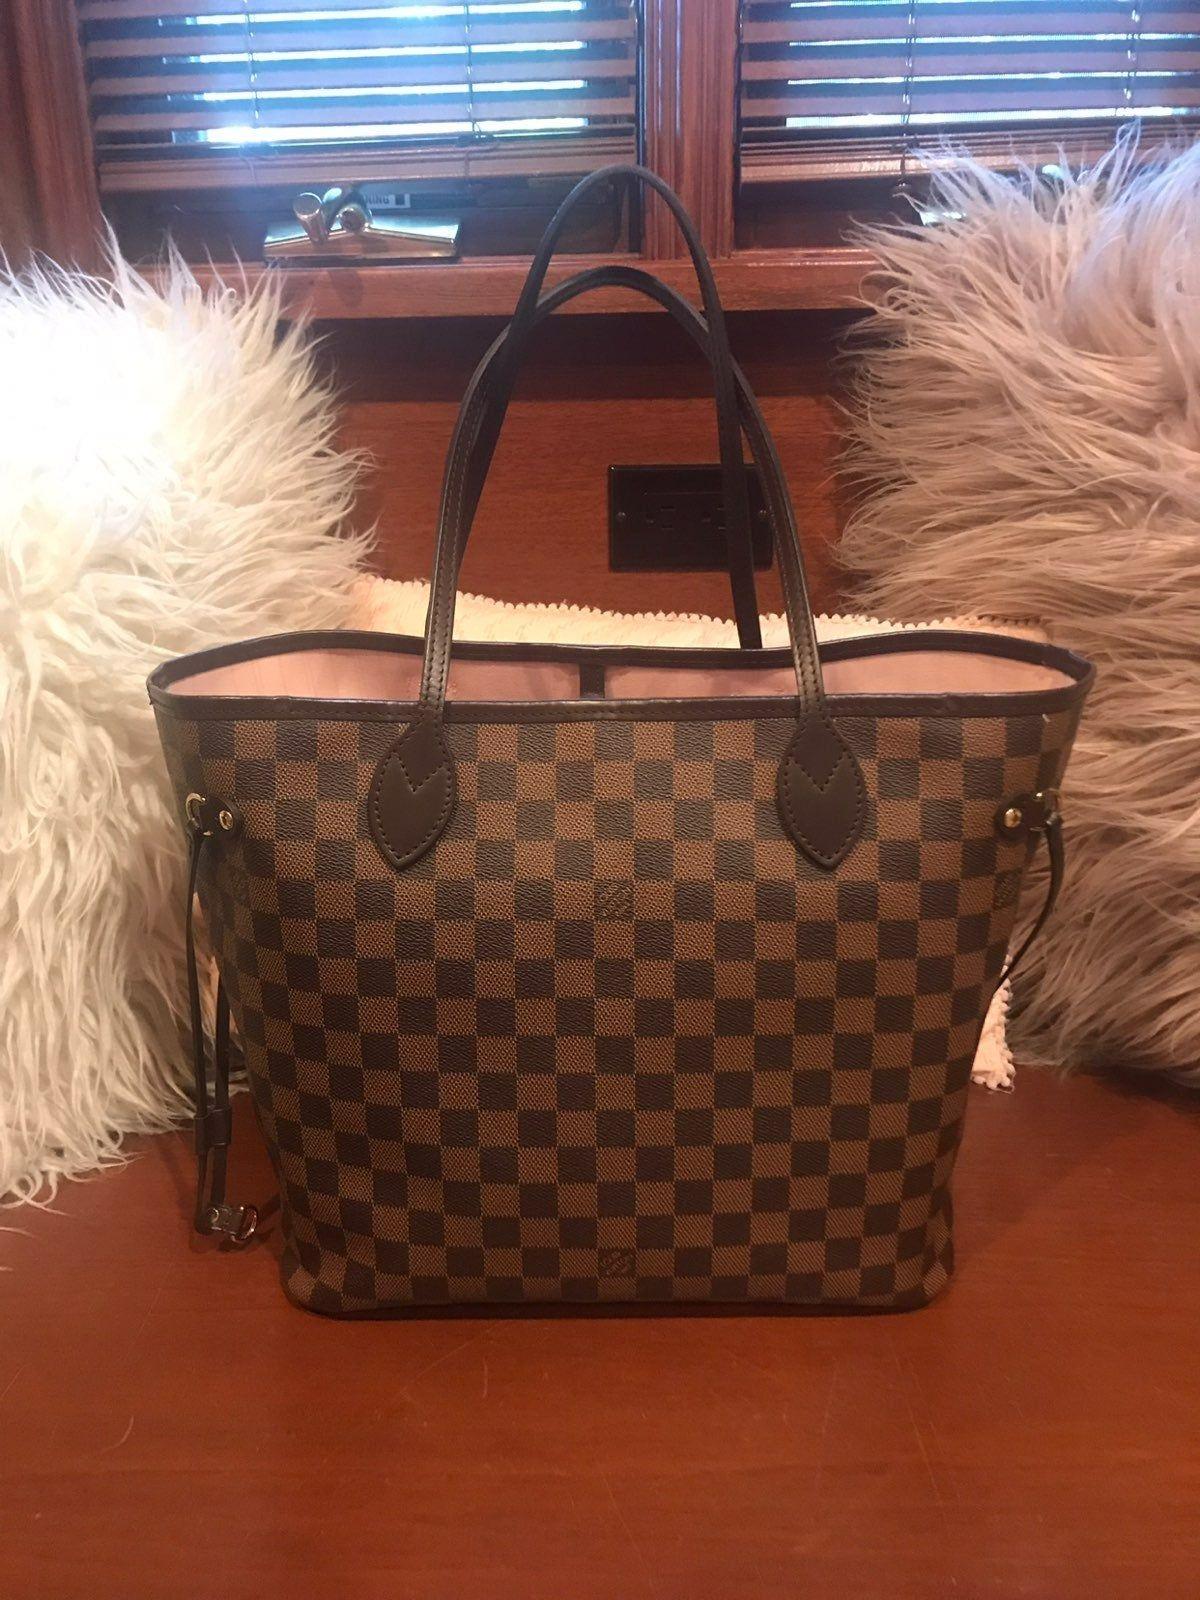 Pin On Louis Vuitton Shoulder Bags